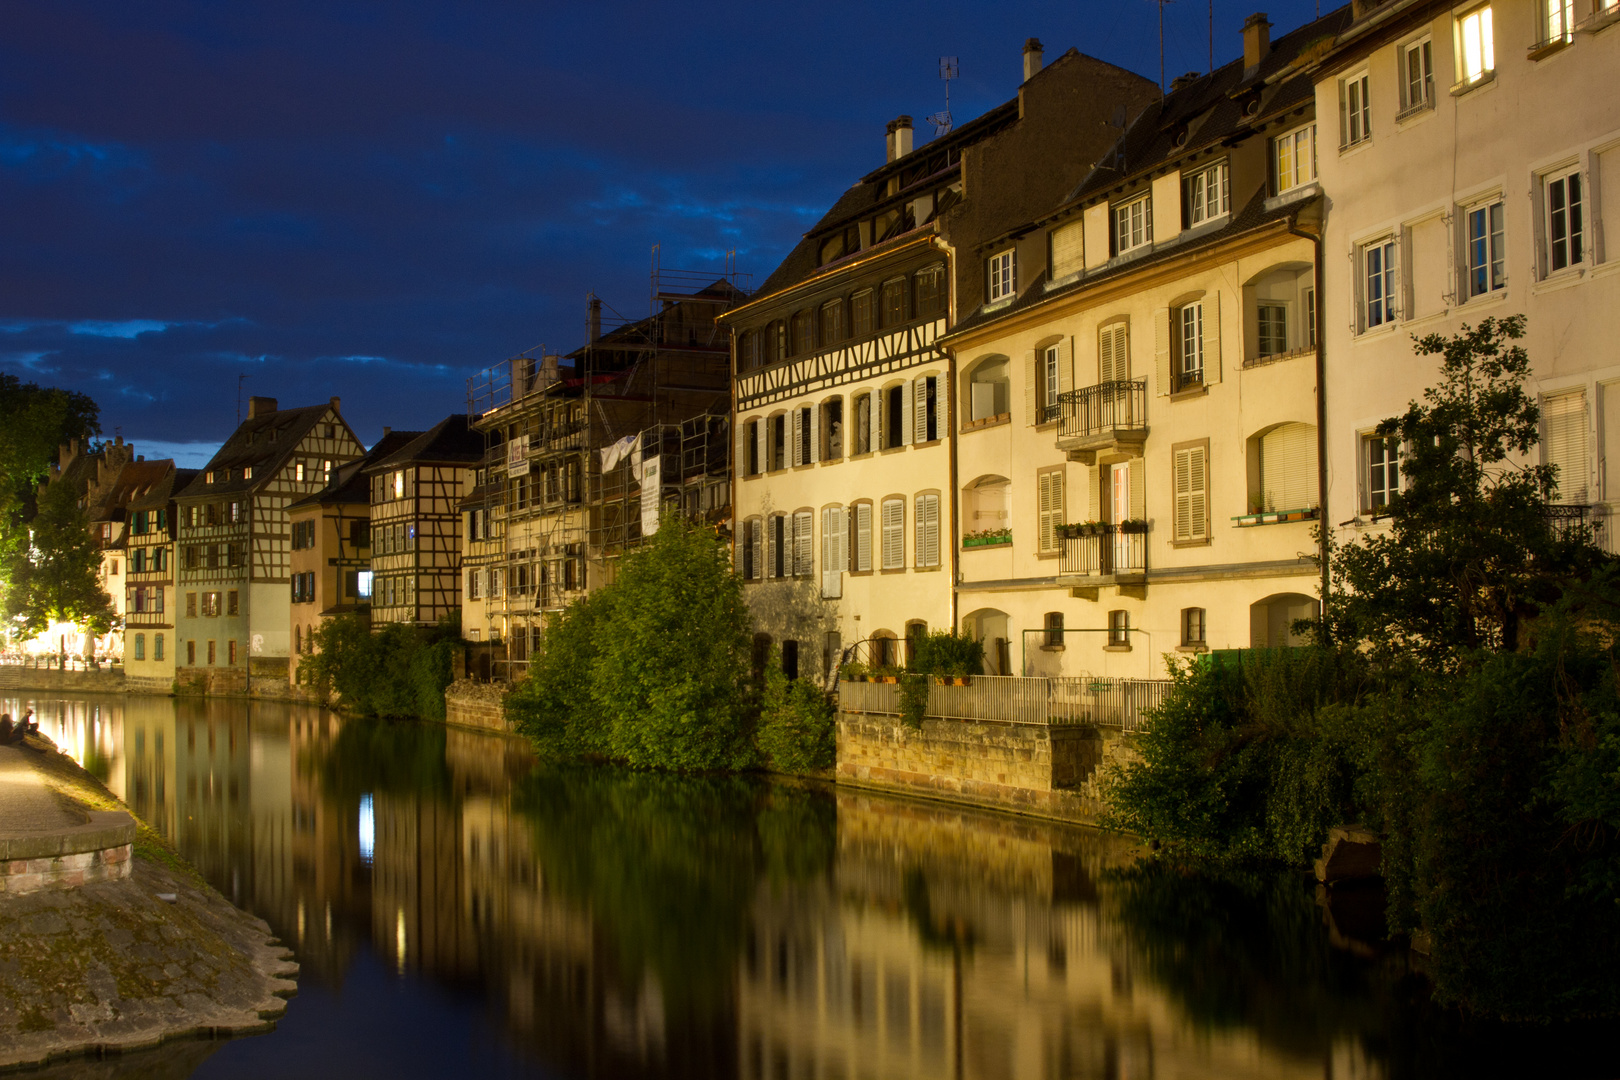 Strasbourg Nightview